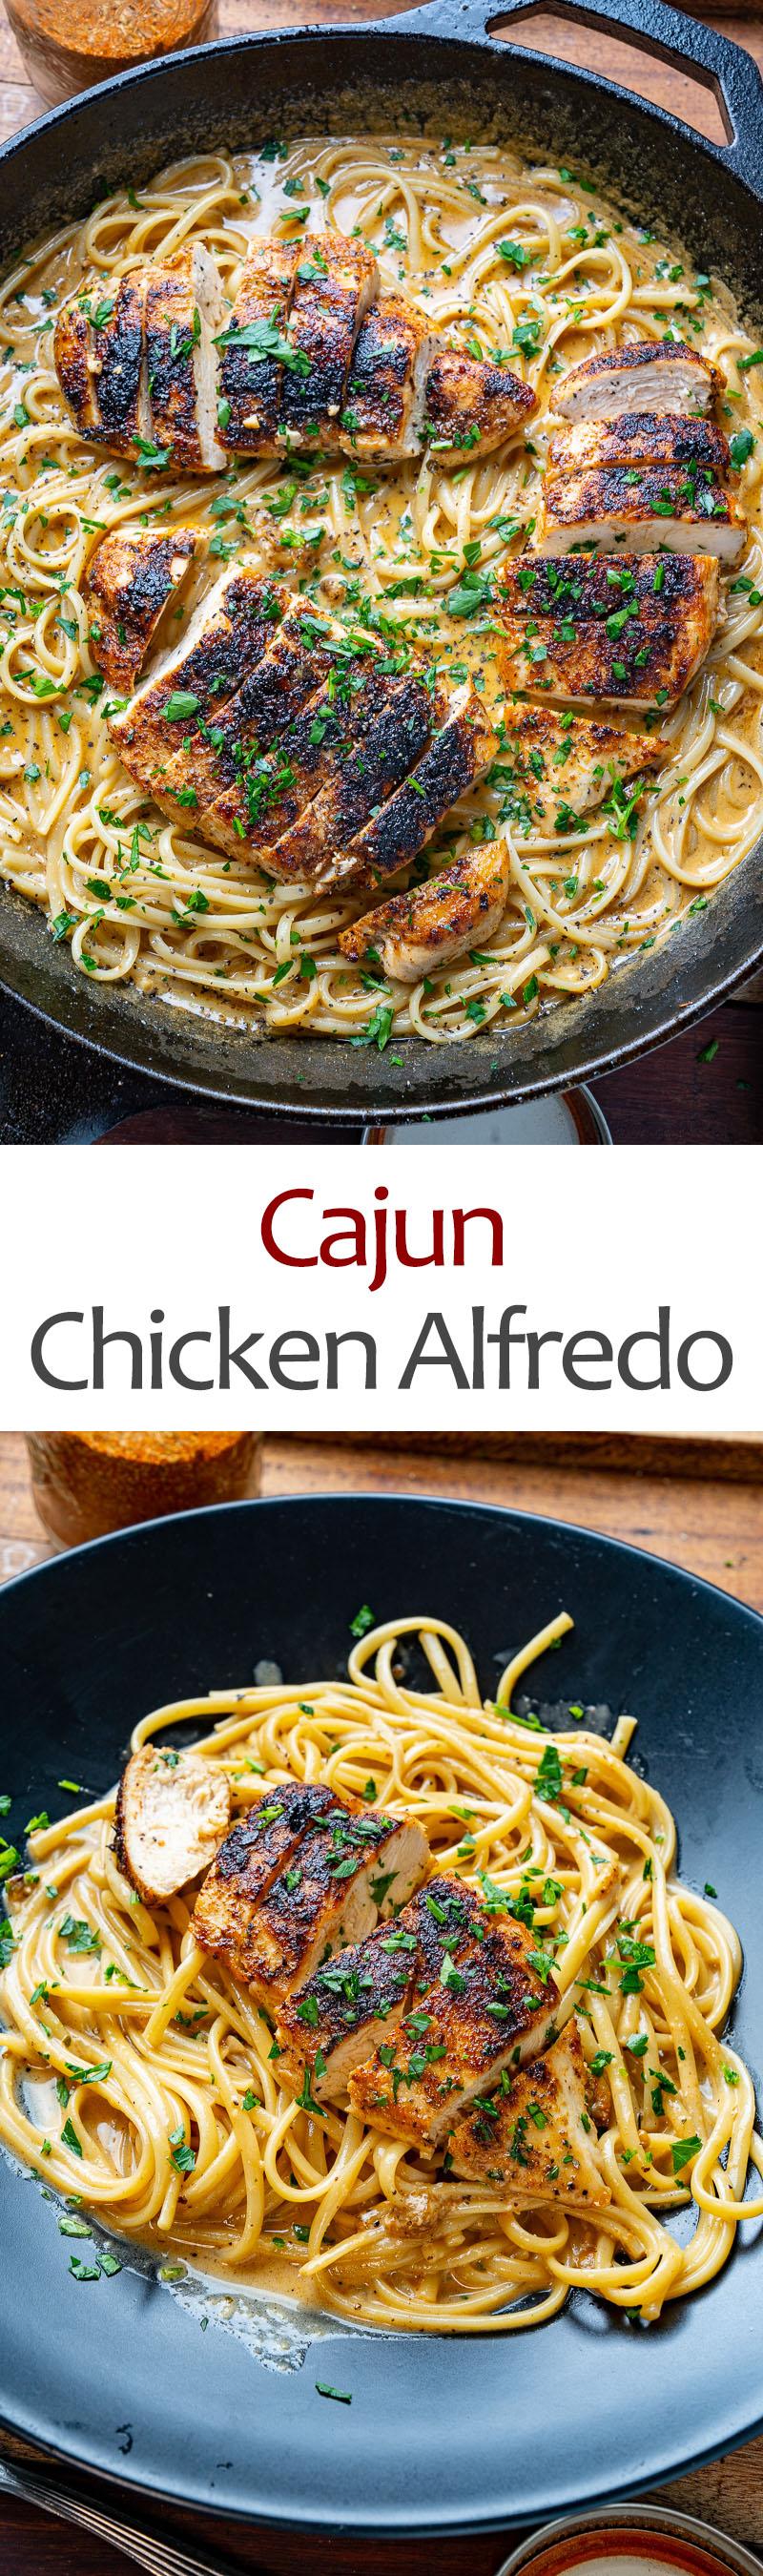 Cajun Chicken Alfredo